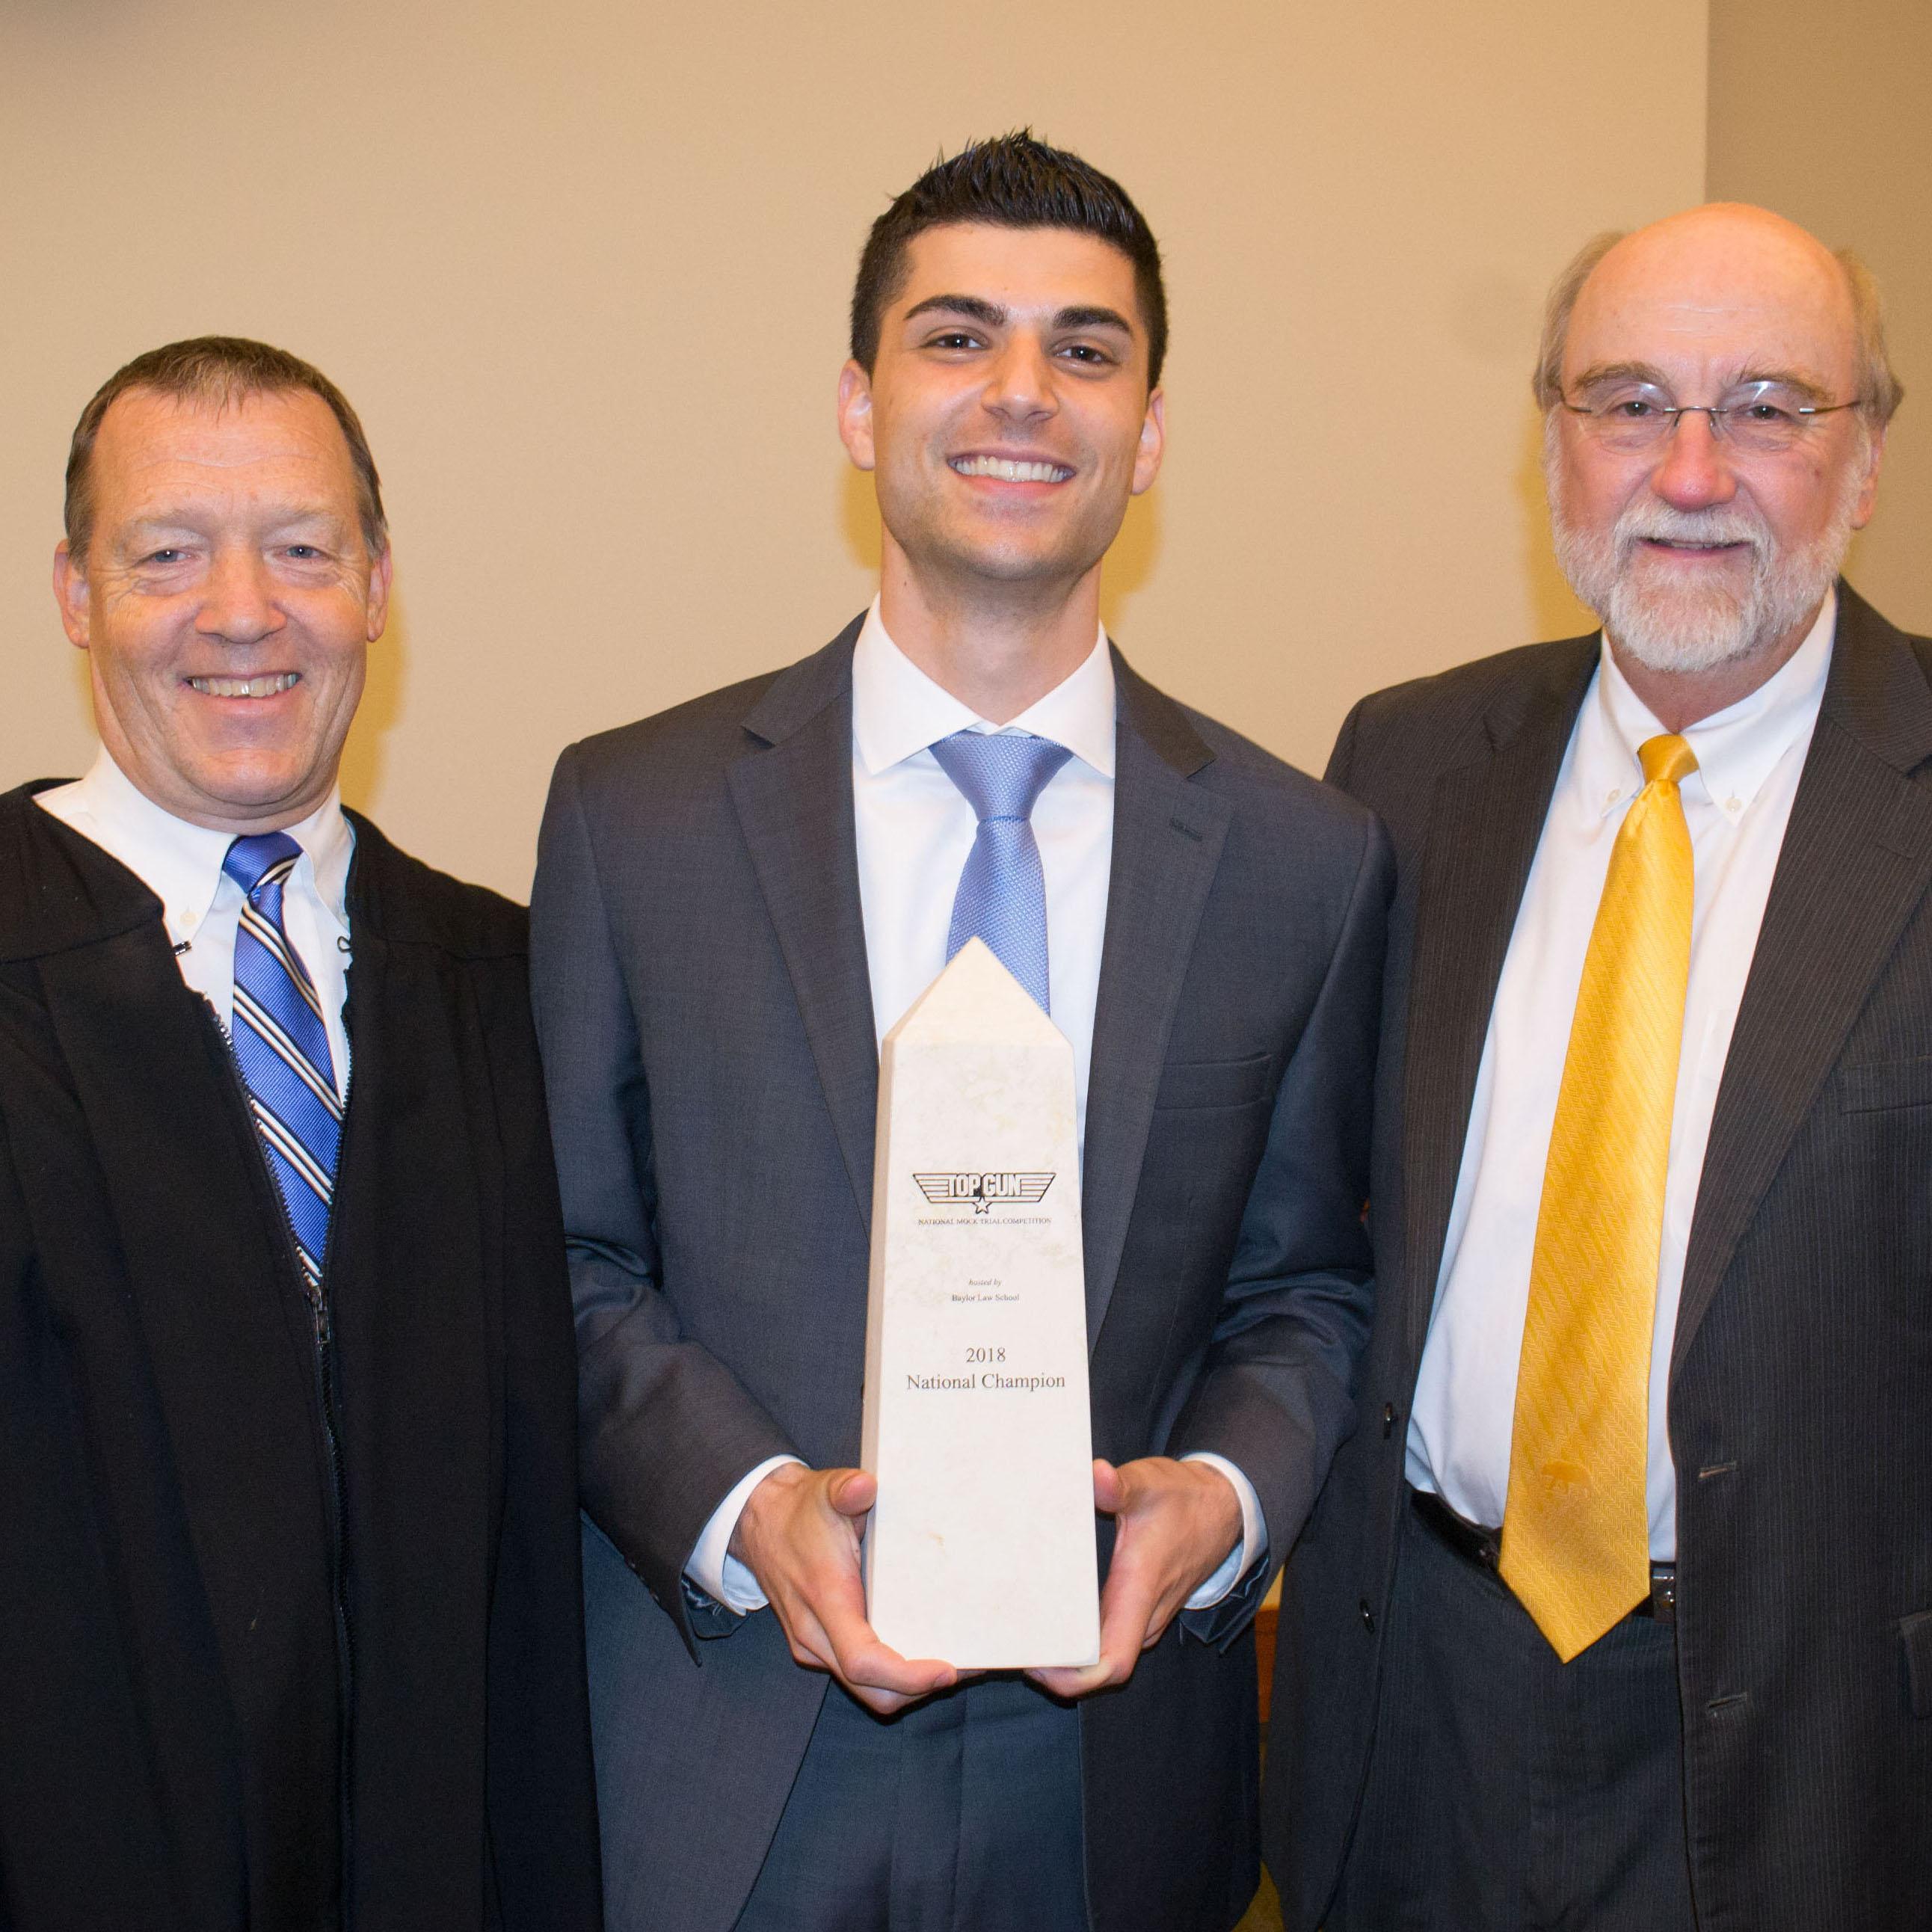 Philip Pasquarello receives his award for Top Gun from Judge Albright and Professor Powell